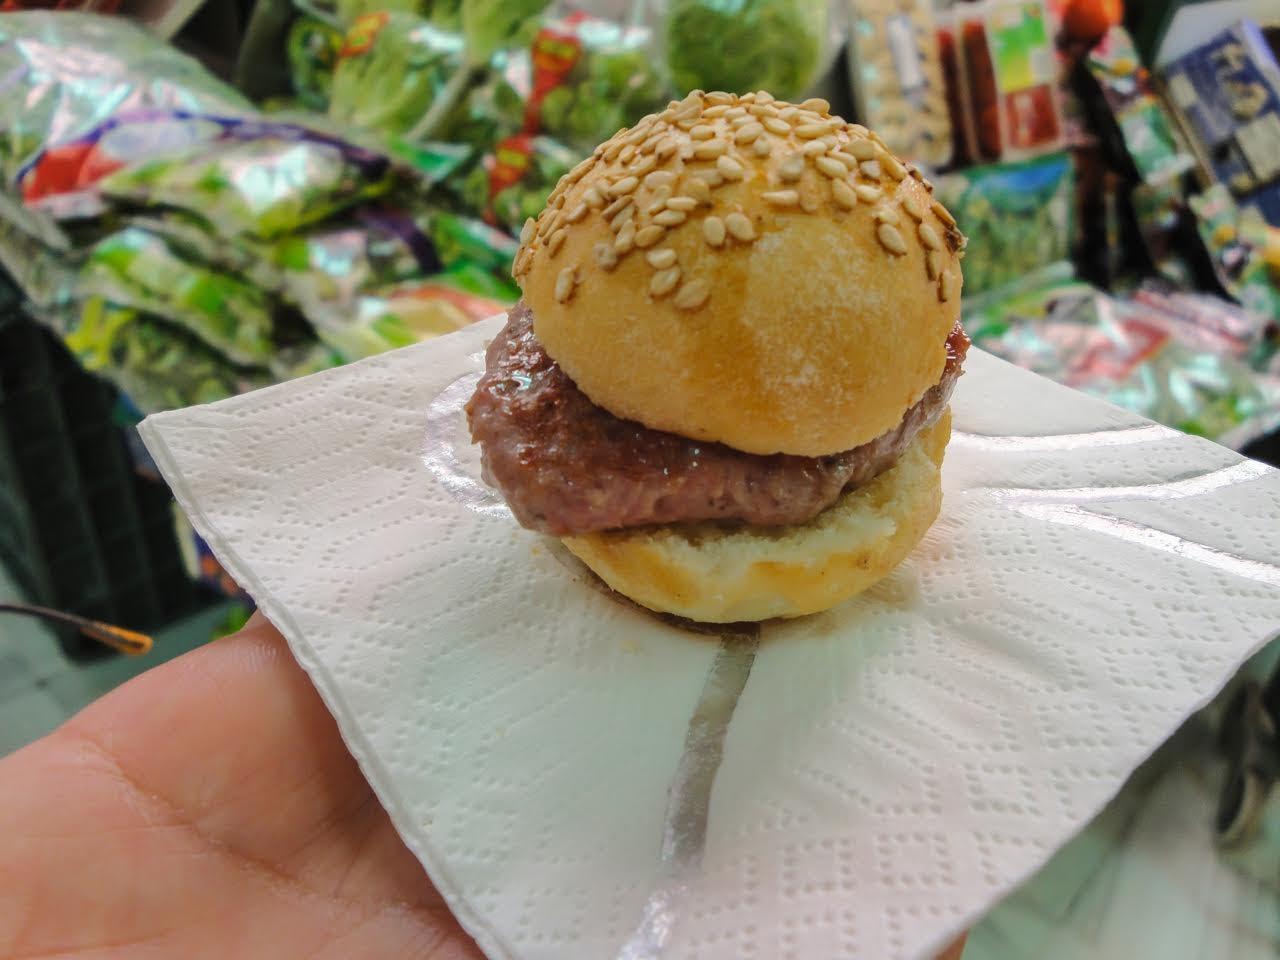 A free mini sample of their hamburgers